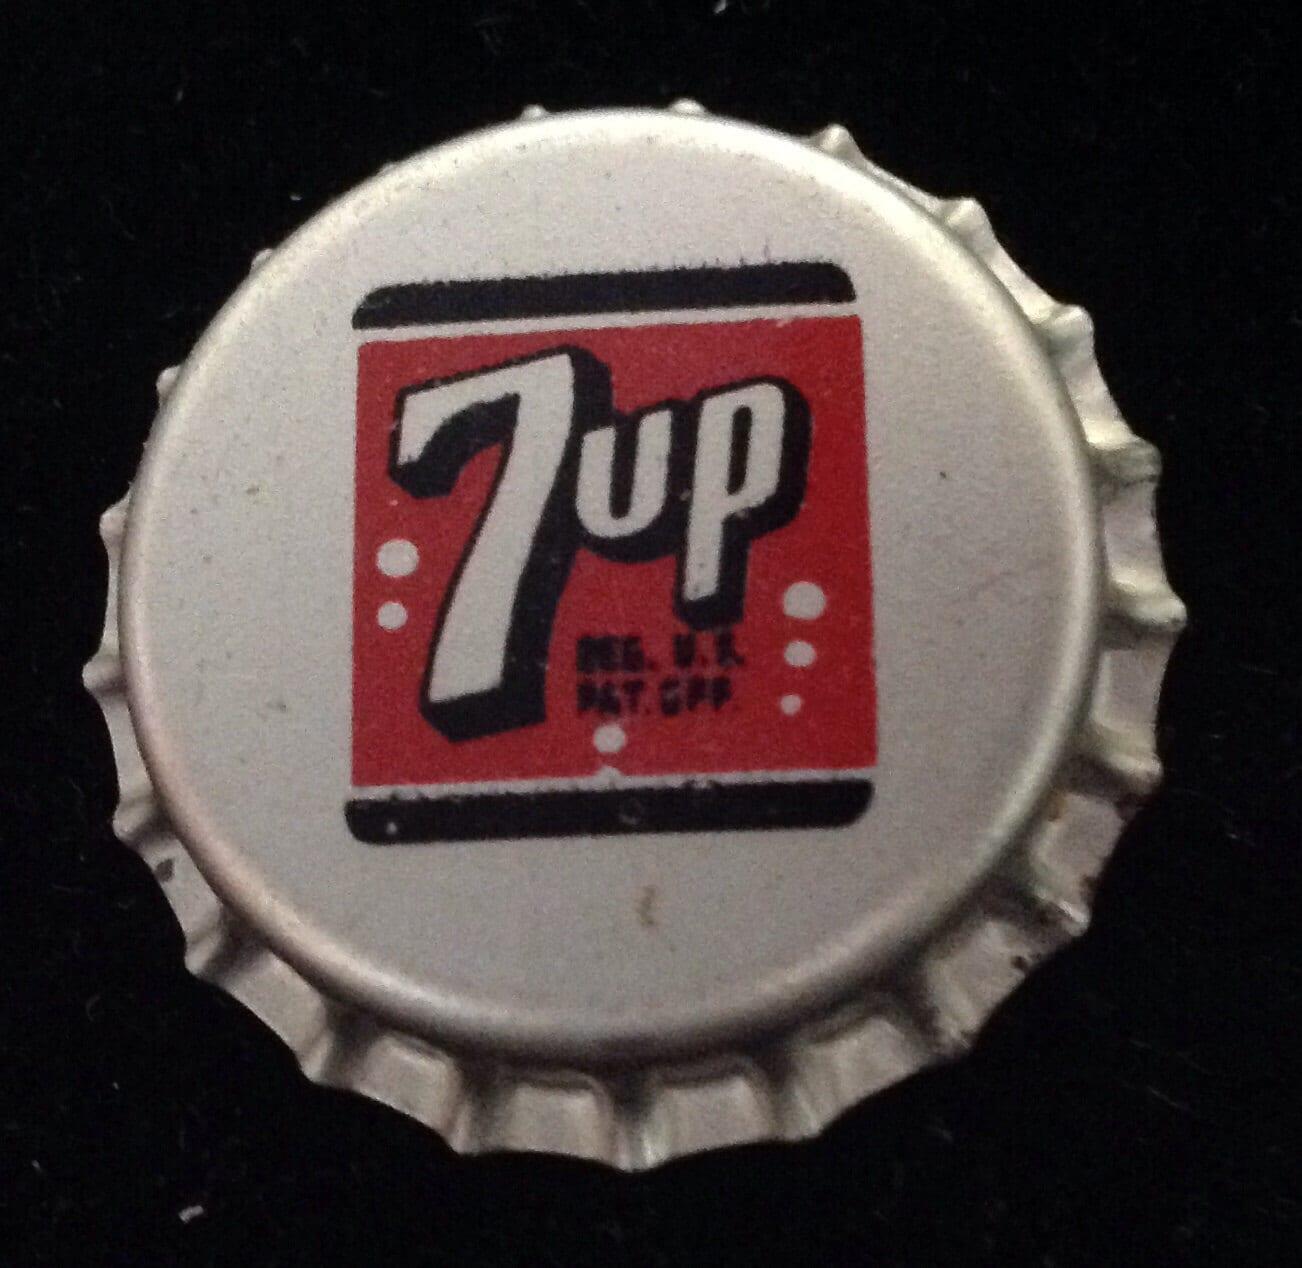 7up soda bottle cap cork sale by txsodajerks on etsy for Soda caps for sale